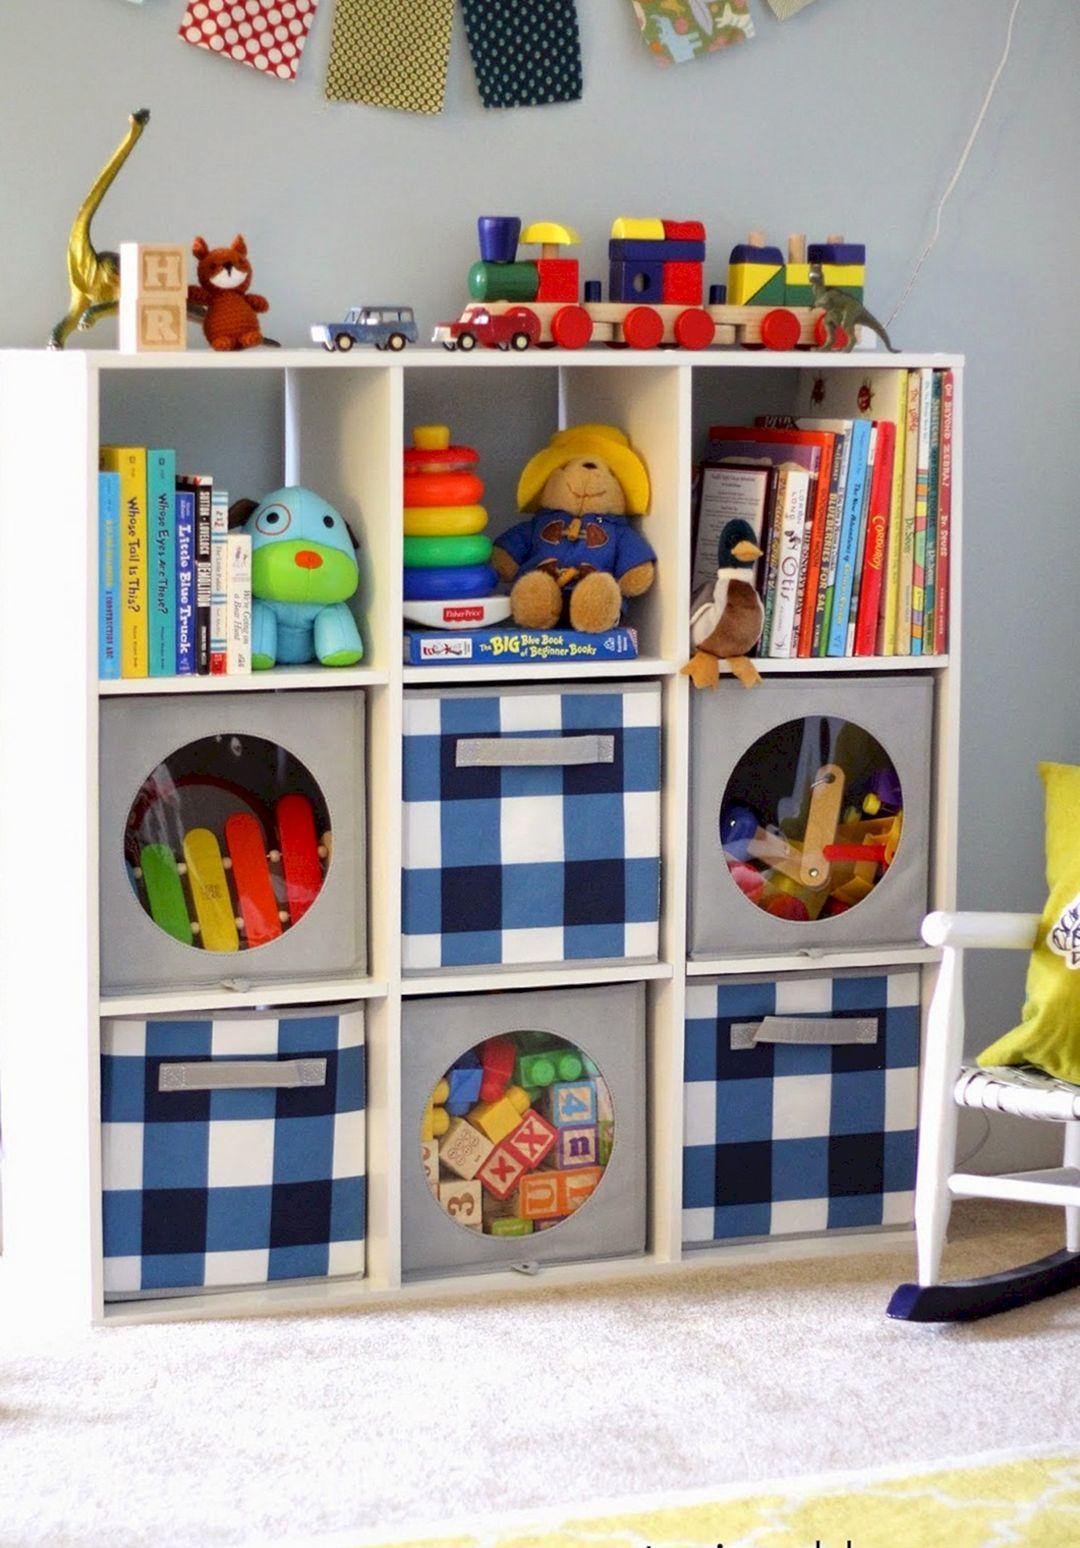 DIY Toy Storage For Small Spaces 13 - DECOREDO